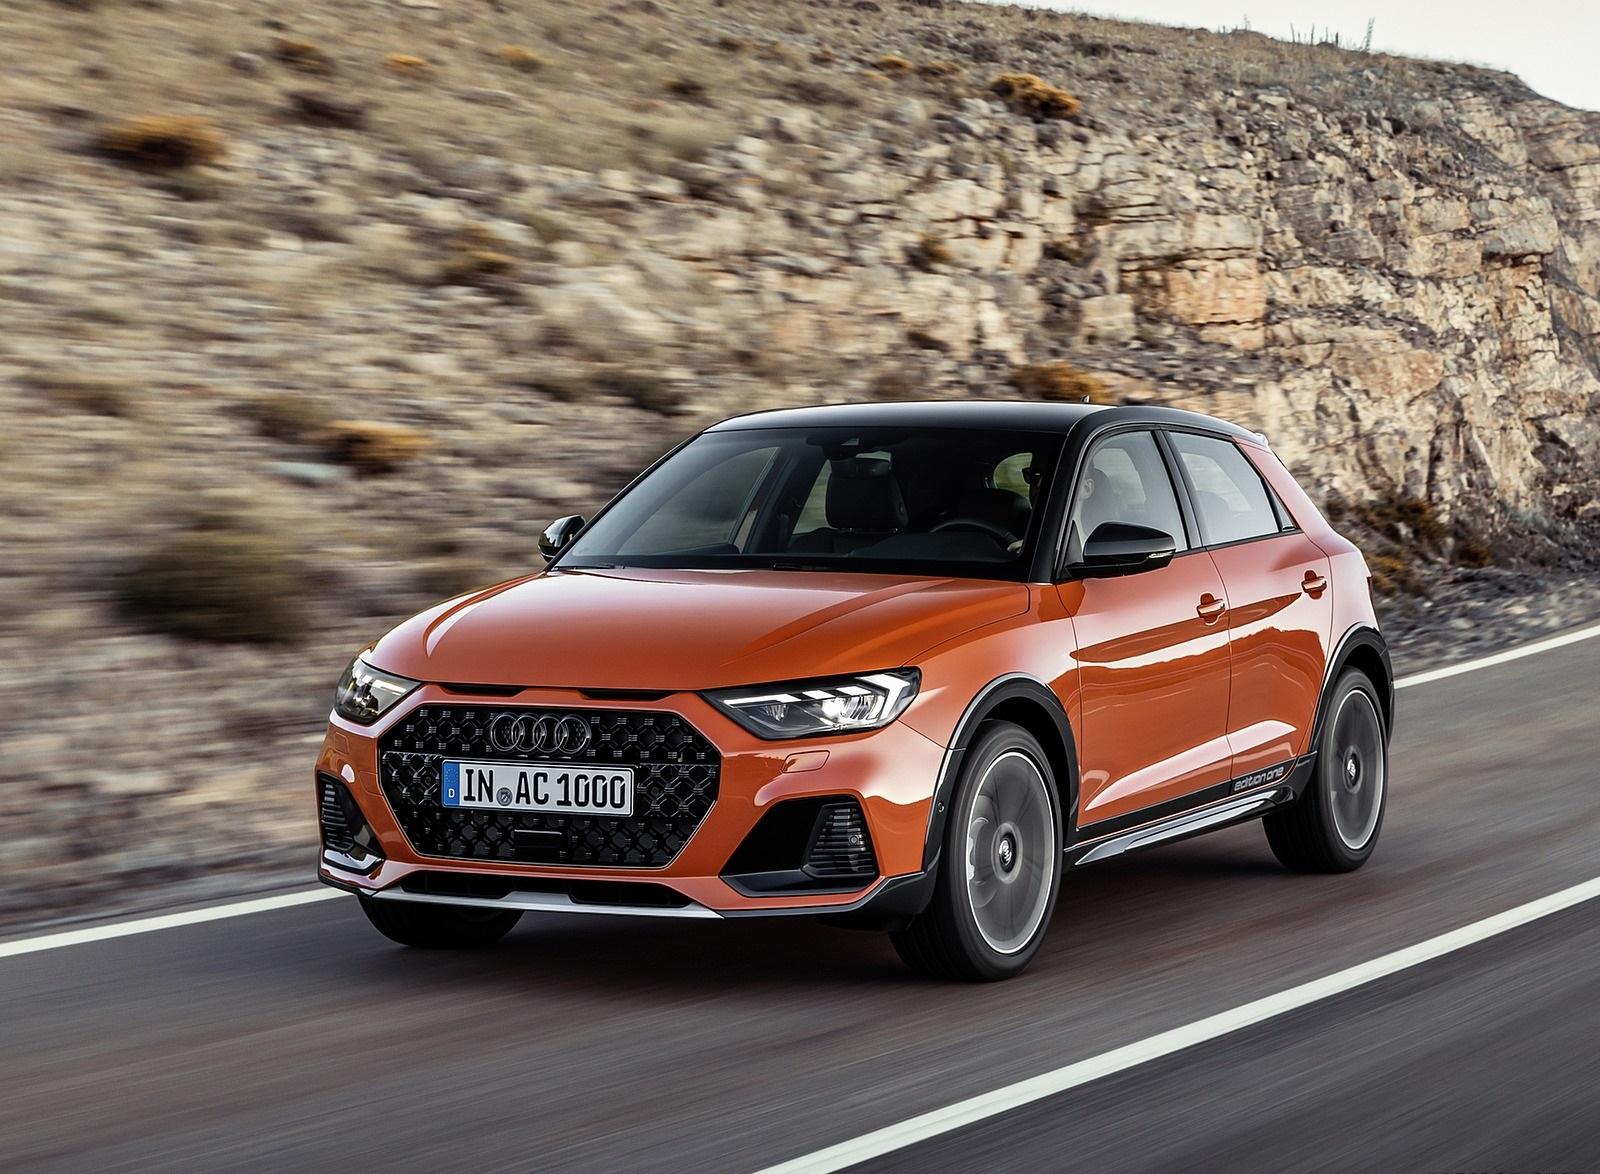 2020 Audi A1 Citycarver (Color: Pulse Orange) Front Three-Quarter Wallpapers (1)